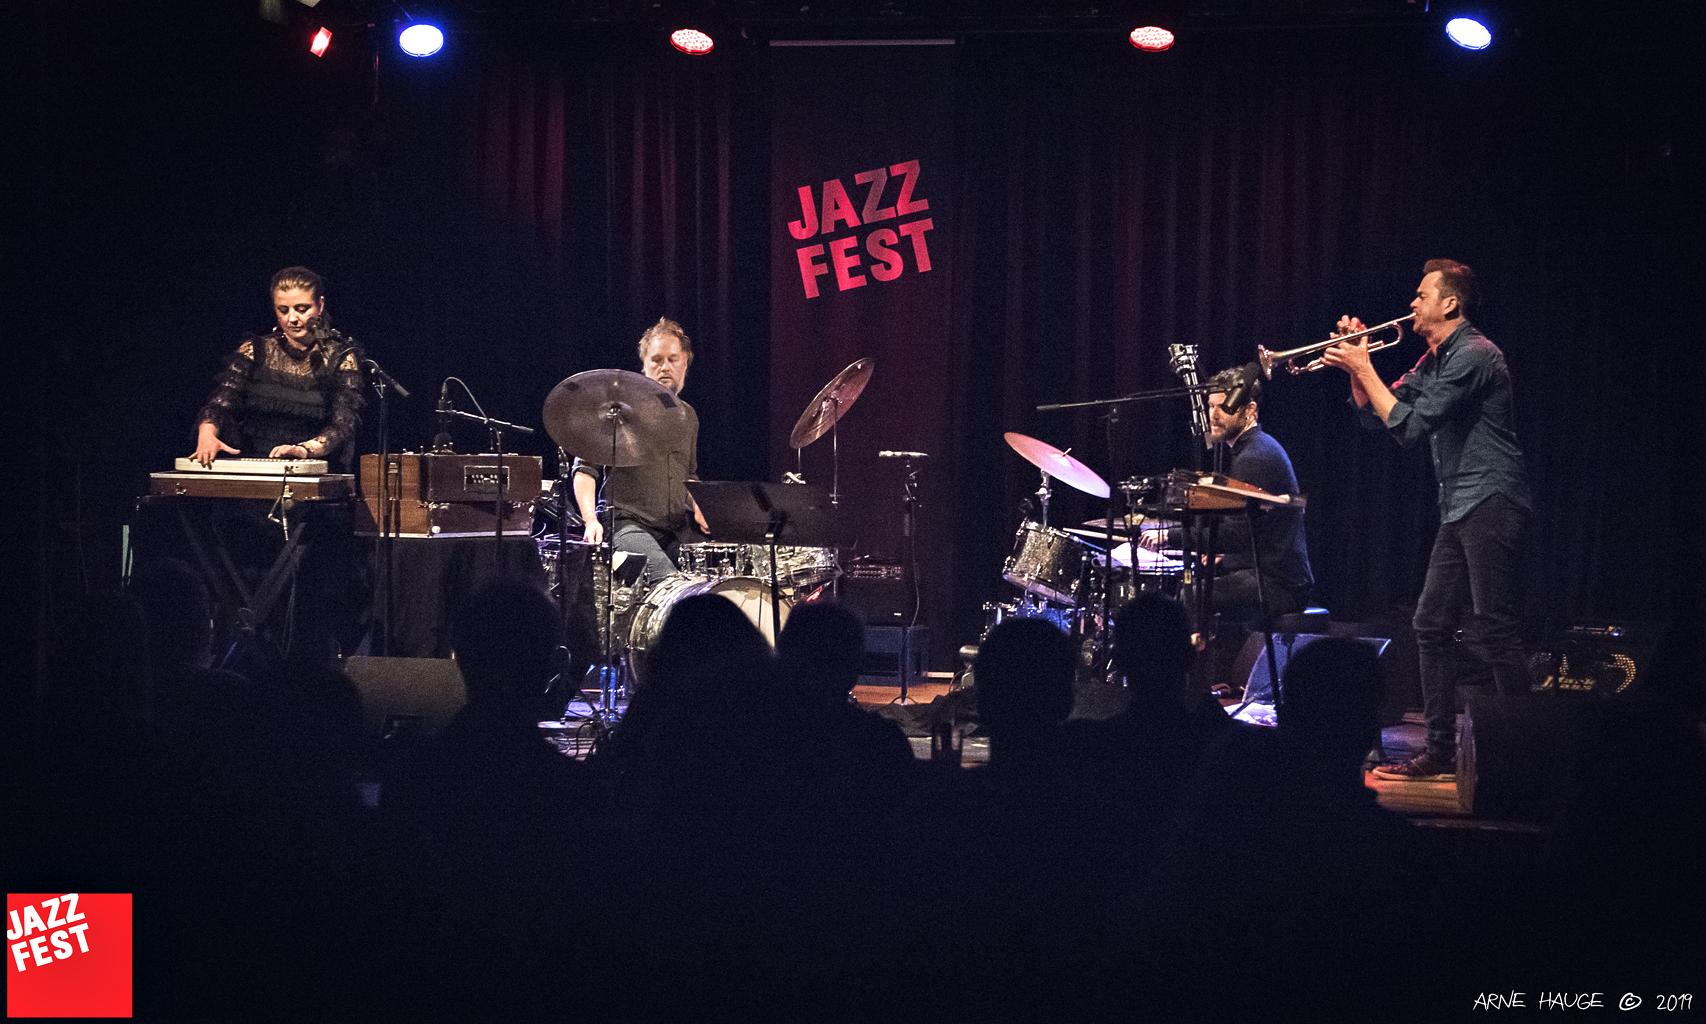 190509 Kirsti Huke (Jazz Expo) @ Dokkhuset - foto Arne Hauge_010.jpg